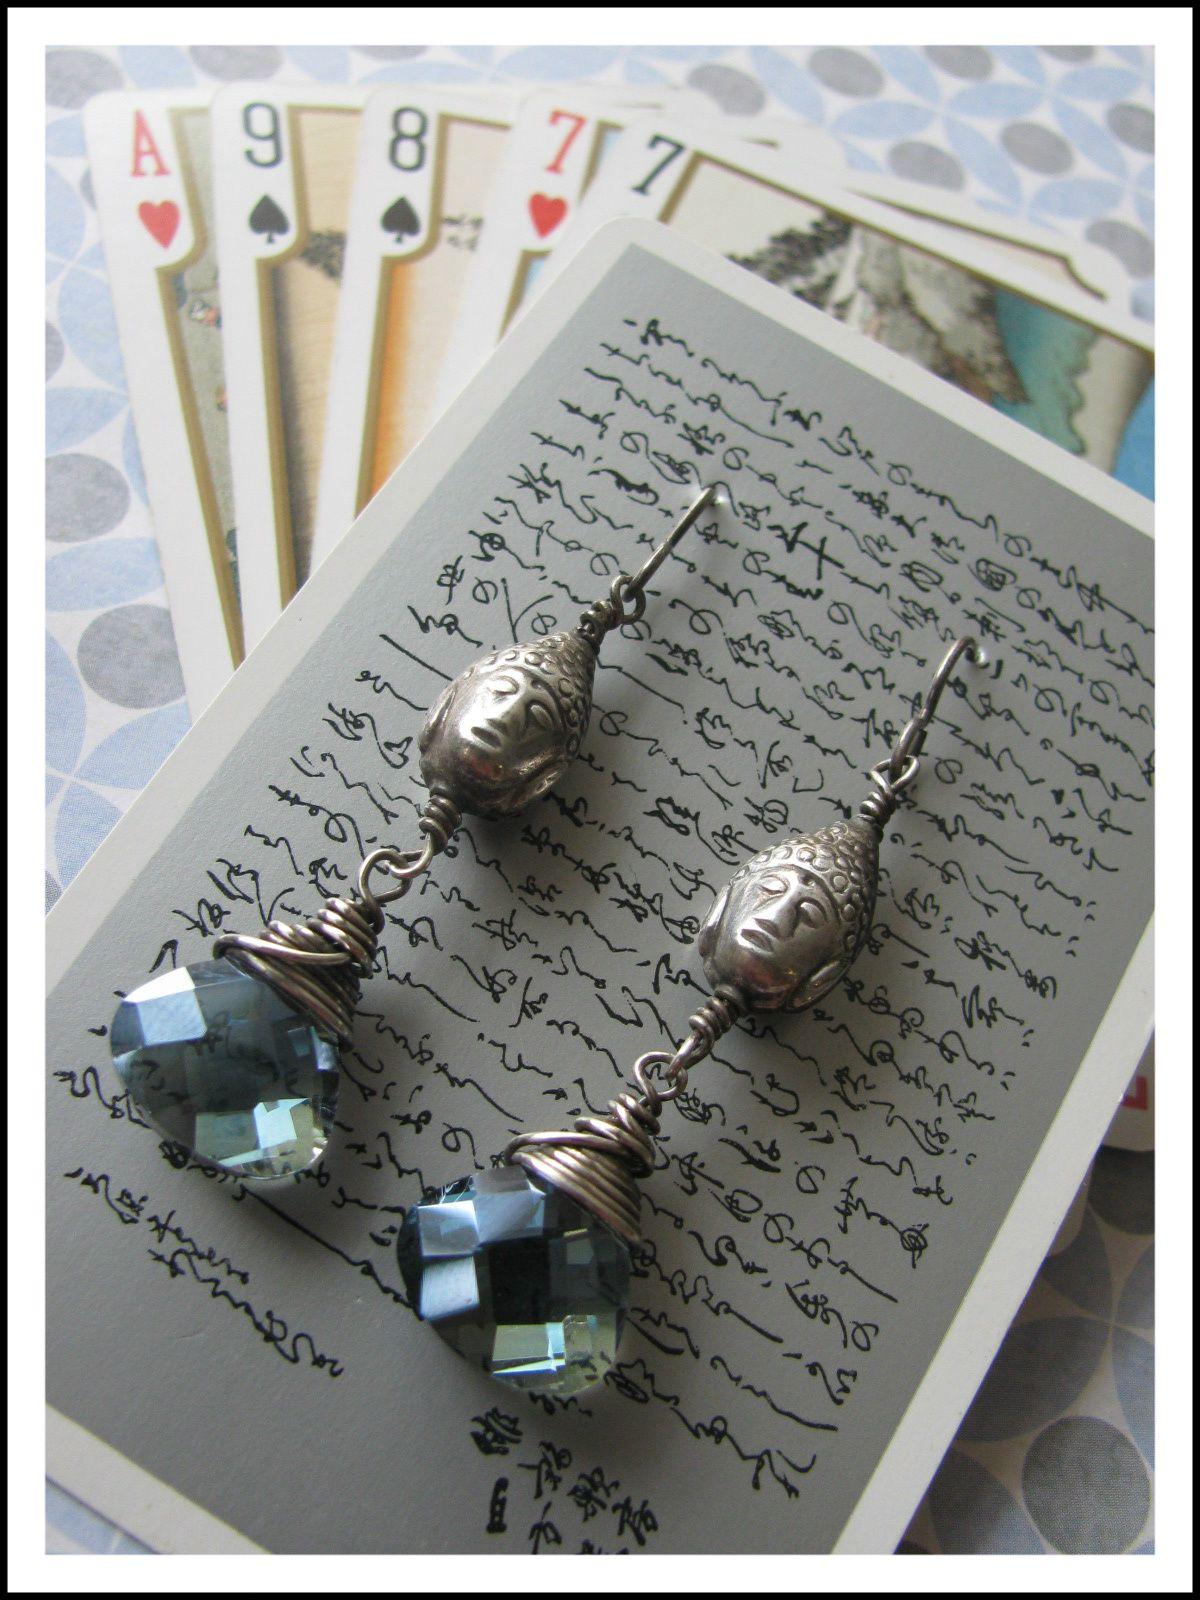 Diy Earring Cards That Won T Break The Bank Rings And Things Diy Earring Cards Earring Cards Jewelry Card